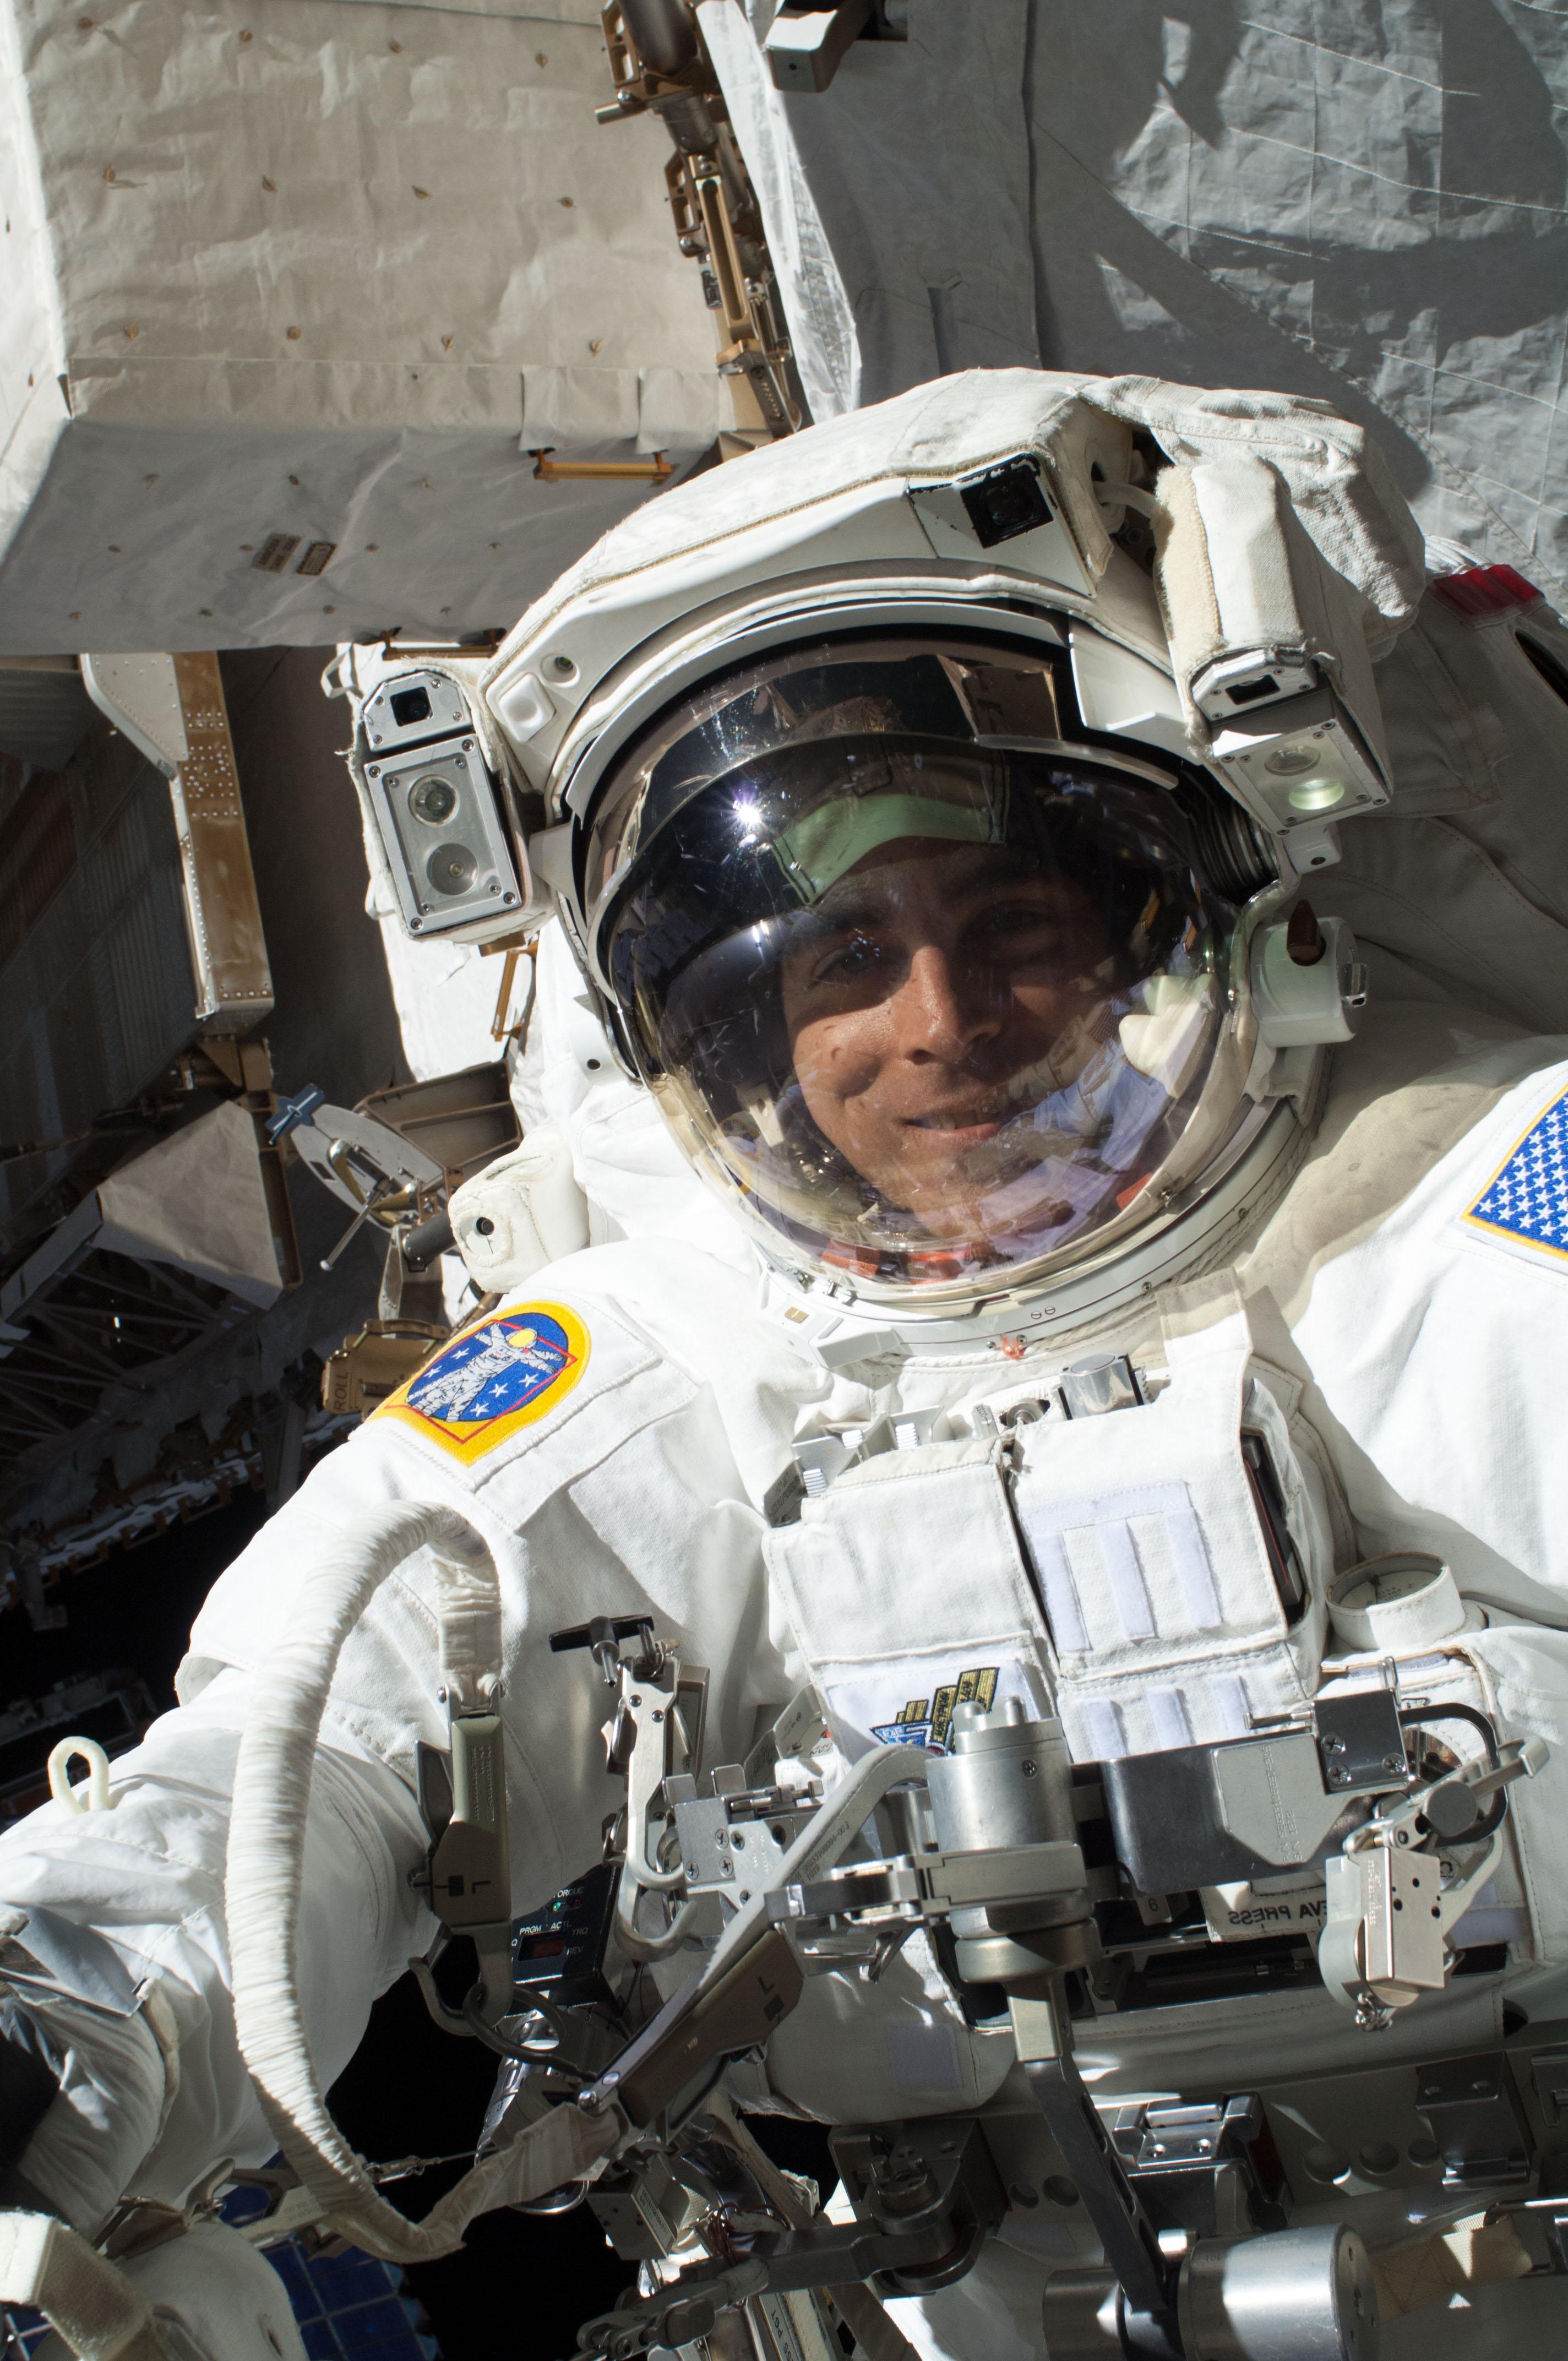 Photos: NASA Aborts Spacewalk After Spacesuit Water Leak